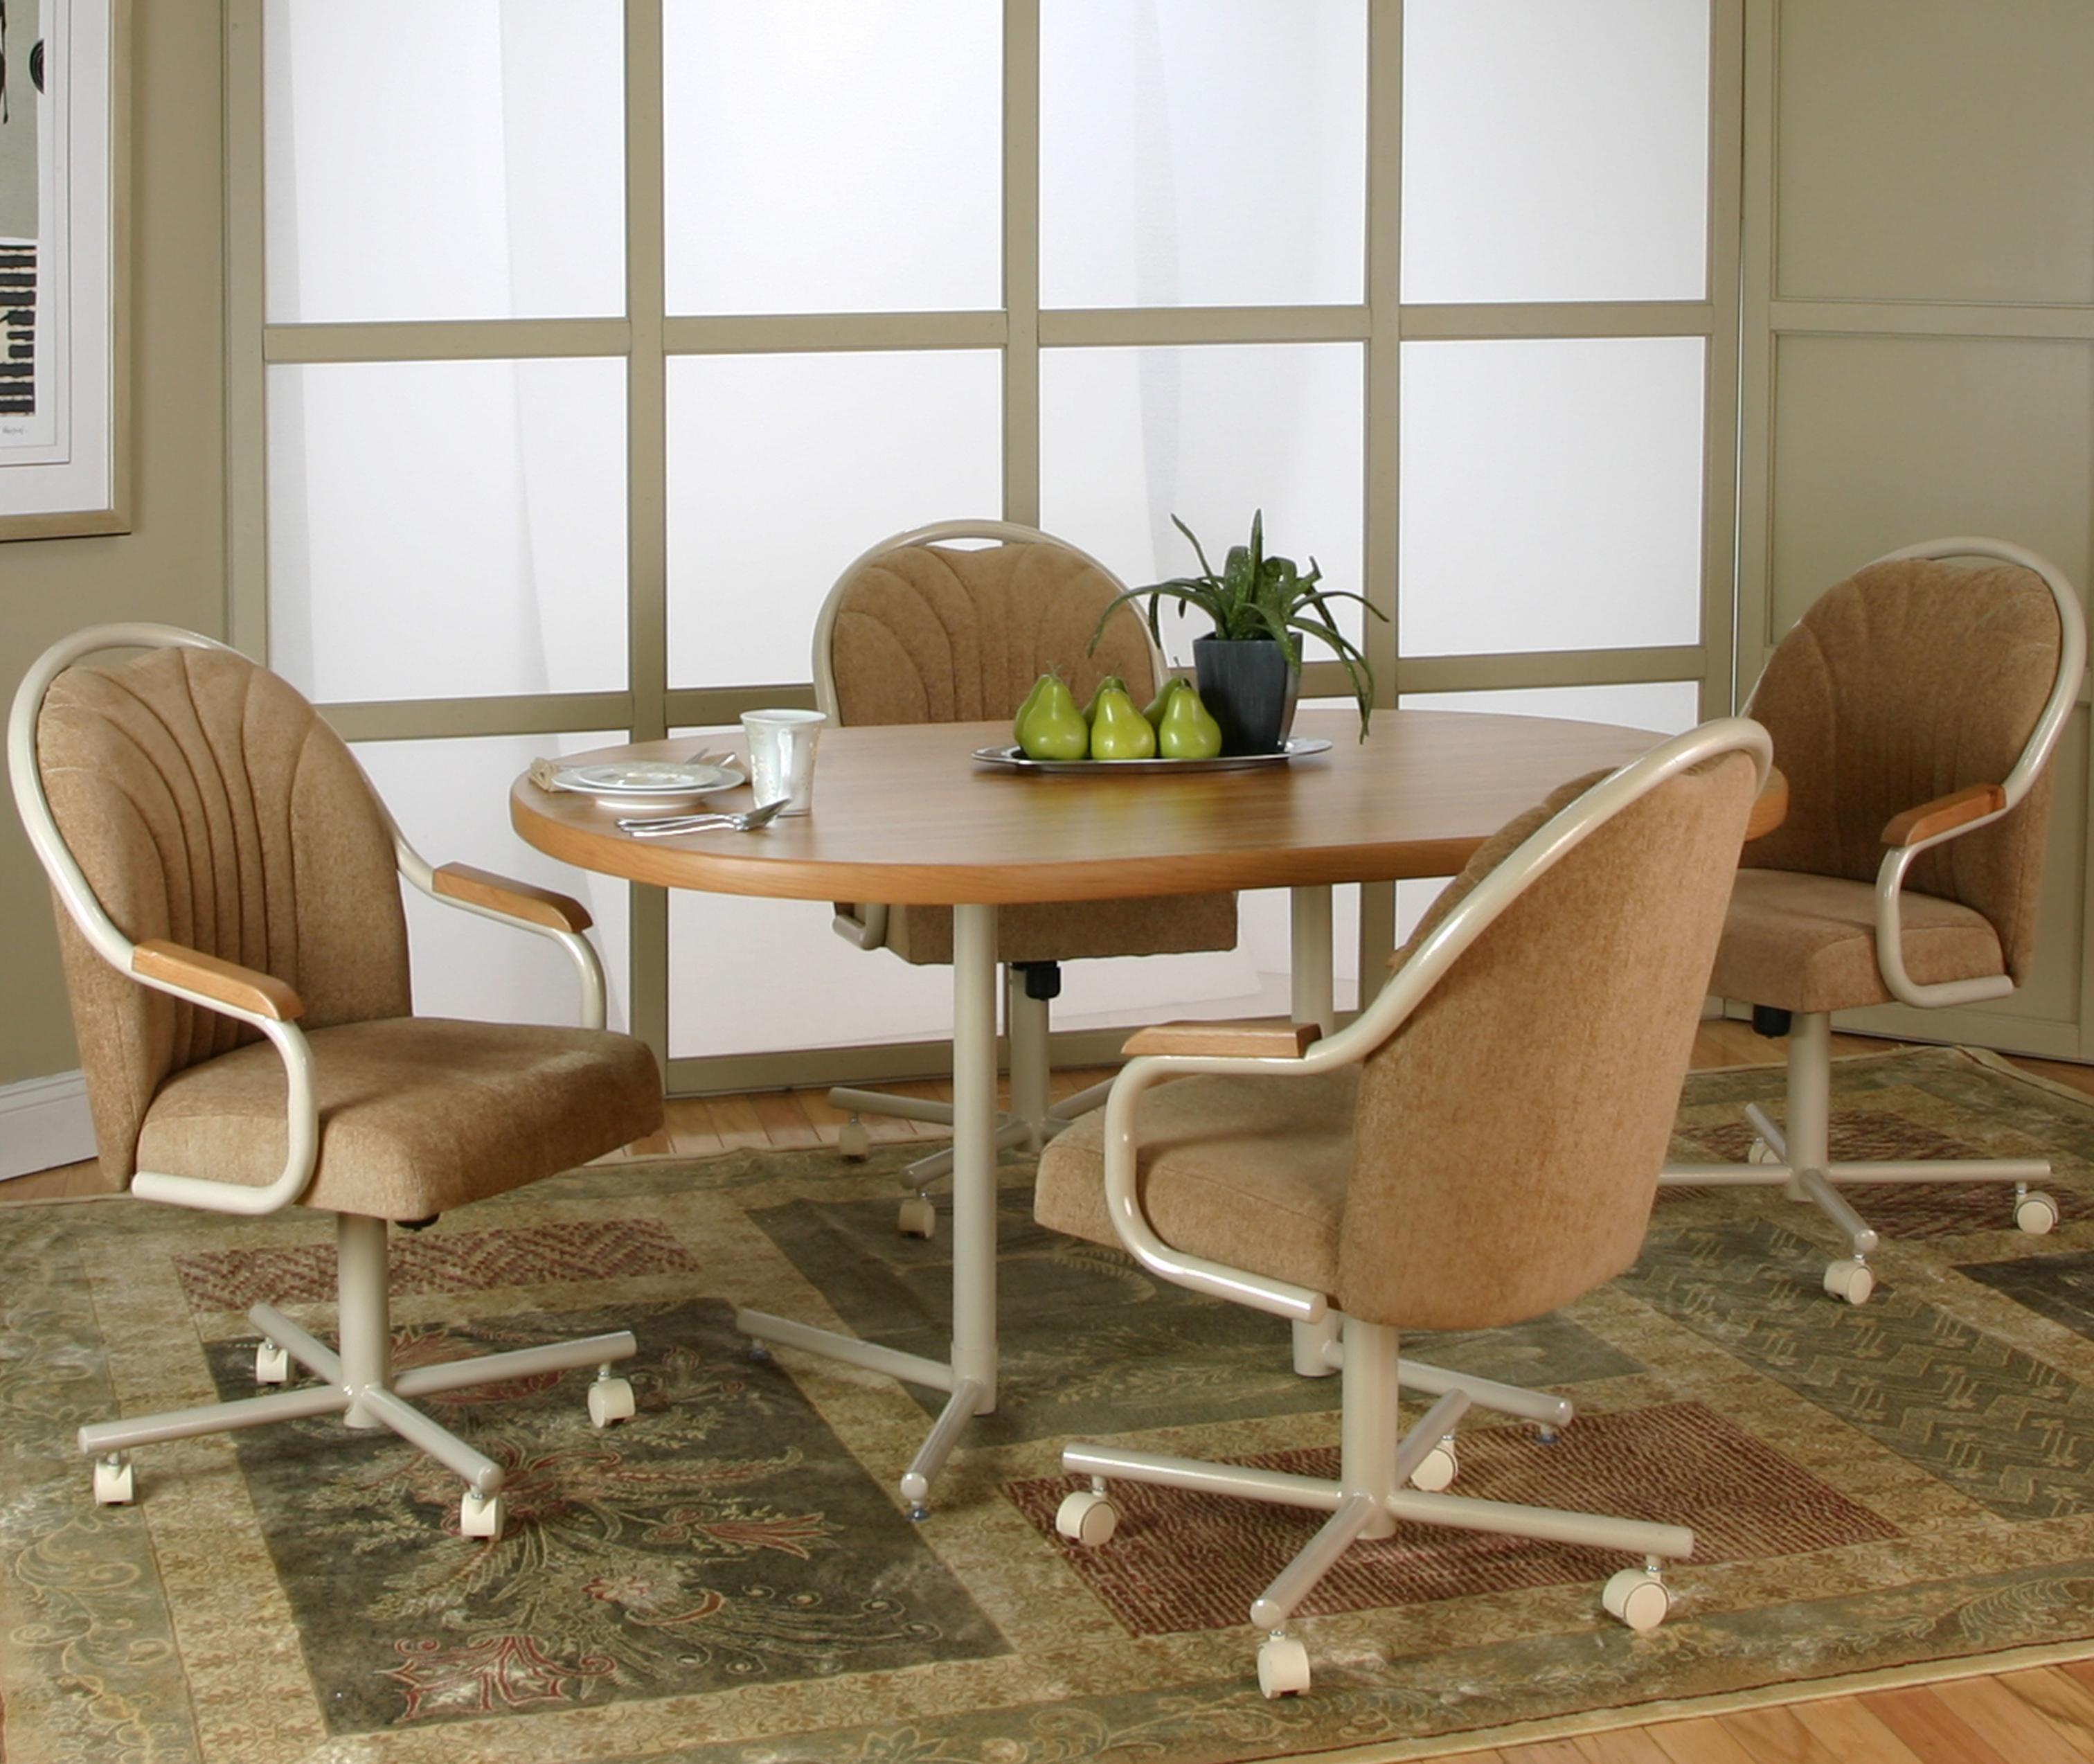 Blair 5 Piece Dining Set By Cramco Inc Modern Kitchen Chair